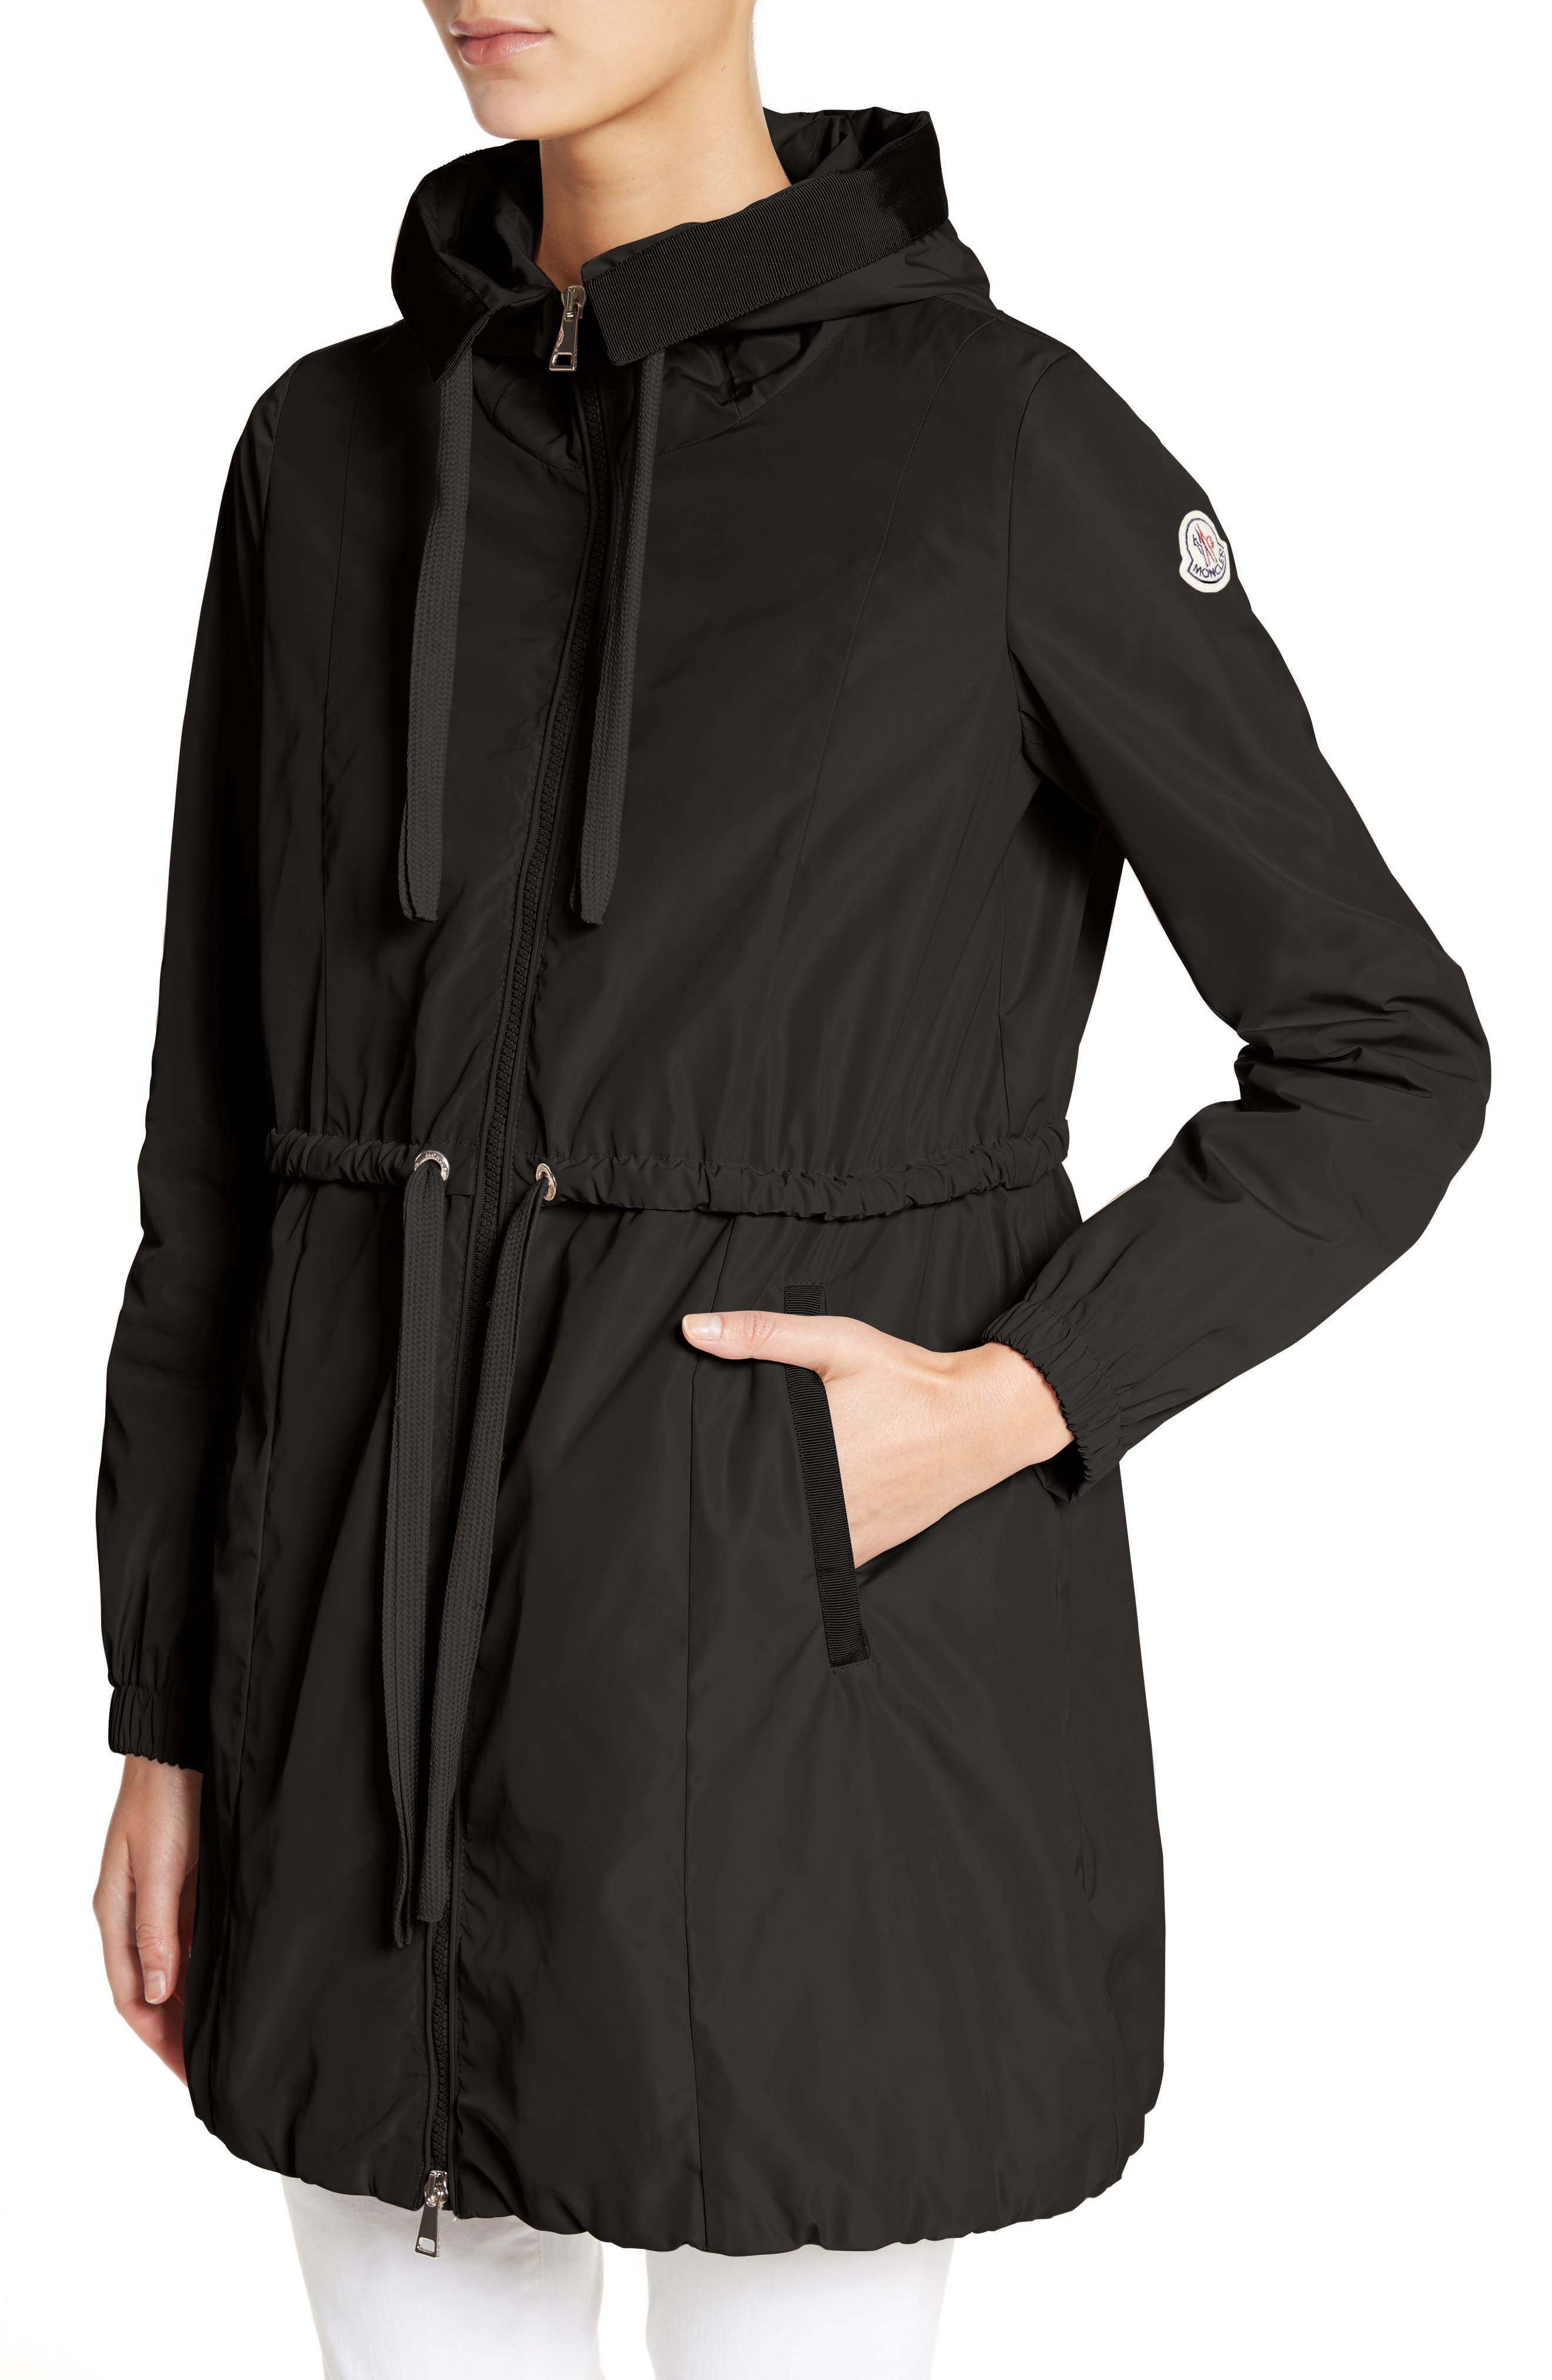 Topaze Water Resistant Hooded Jacket,                             Alternate thumbnail 4, color,                             BLACK